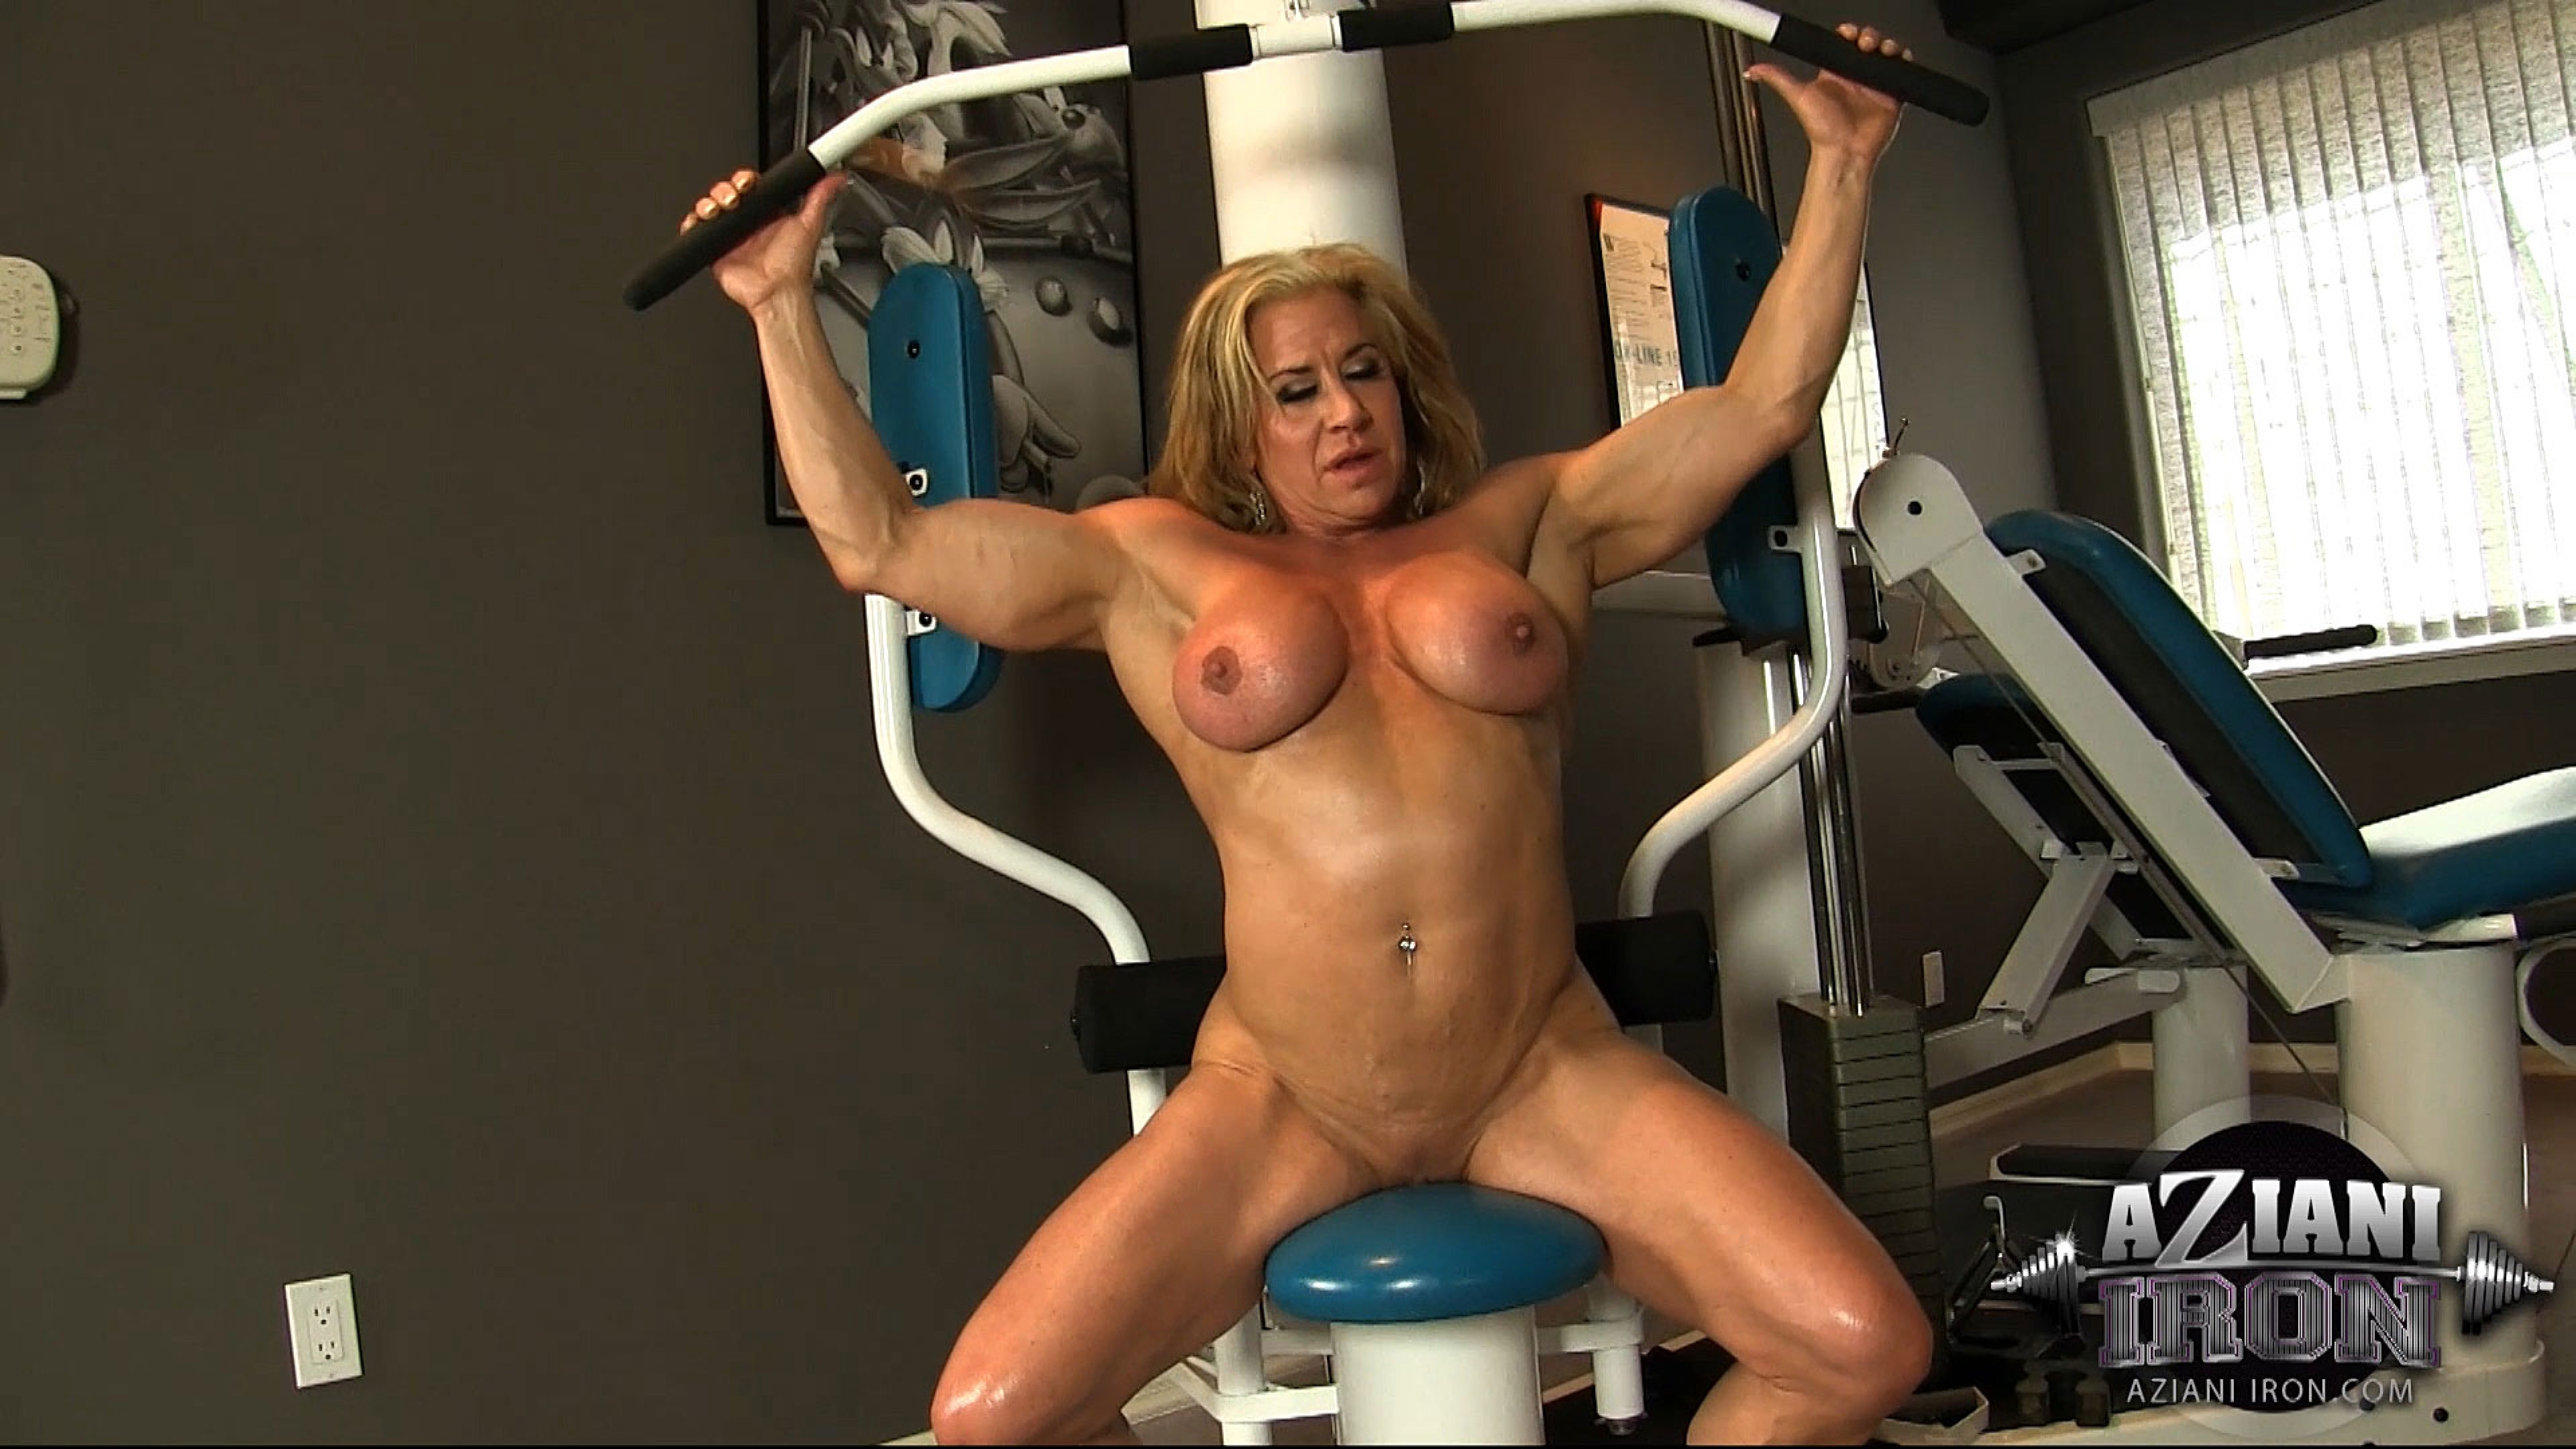 Touching Wanda moore bodybuilder nude pussy